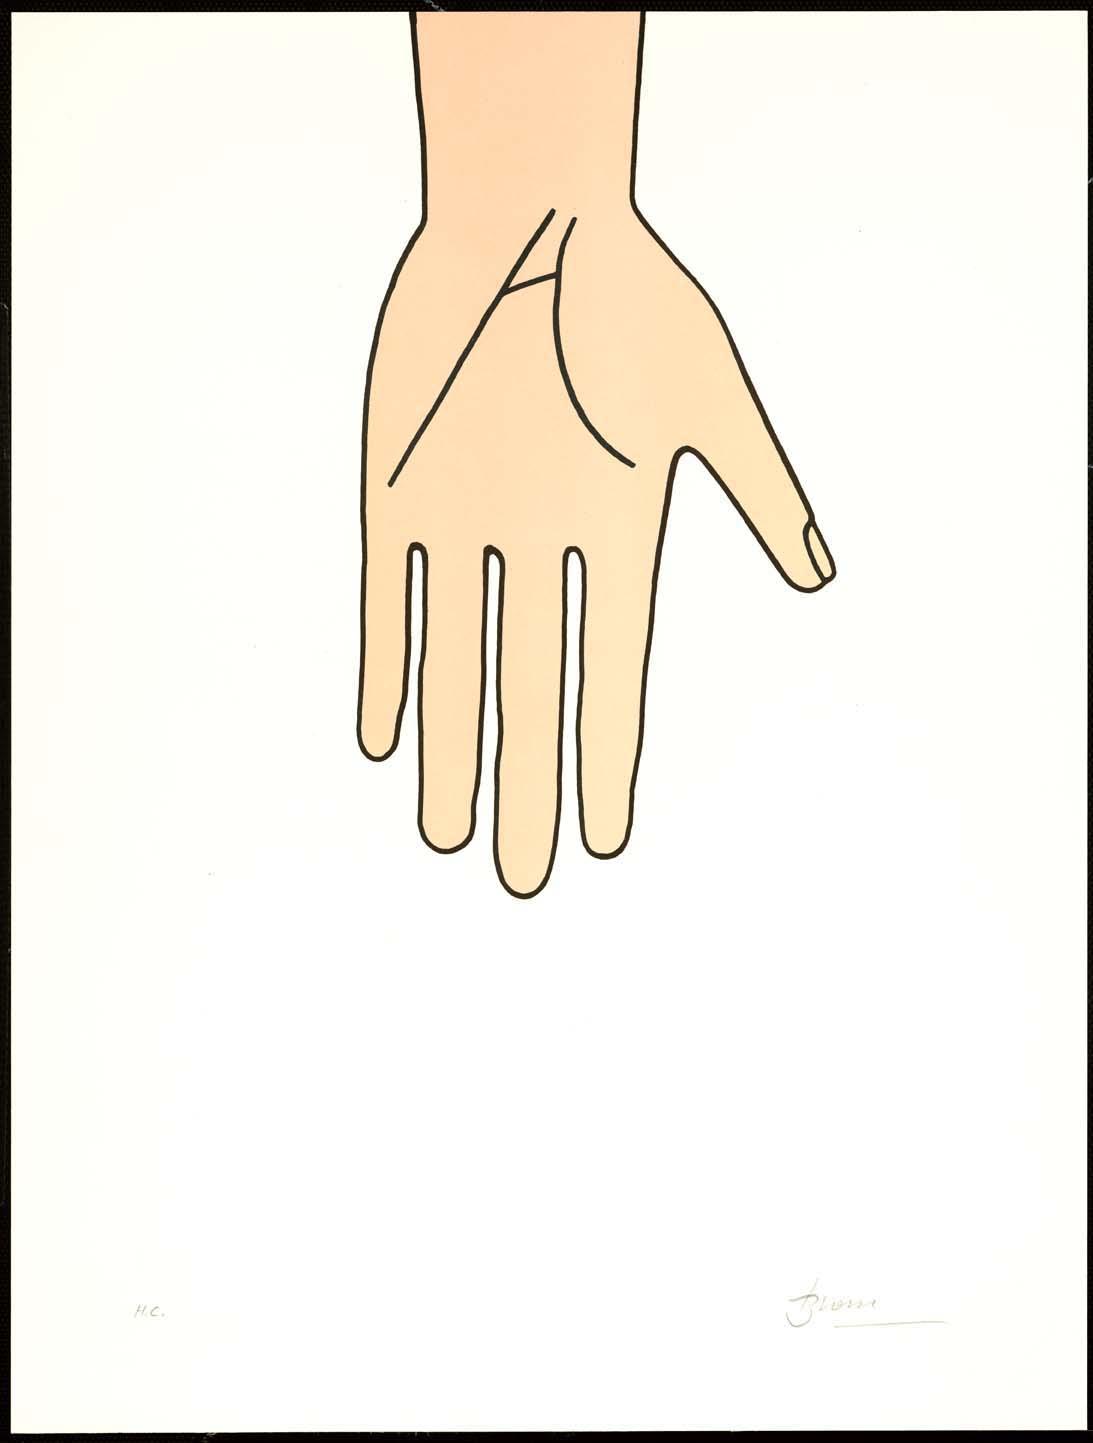 """Poema visual"", Joan Brossa (1989), litografía, medidas: 50 x 38 cm."